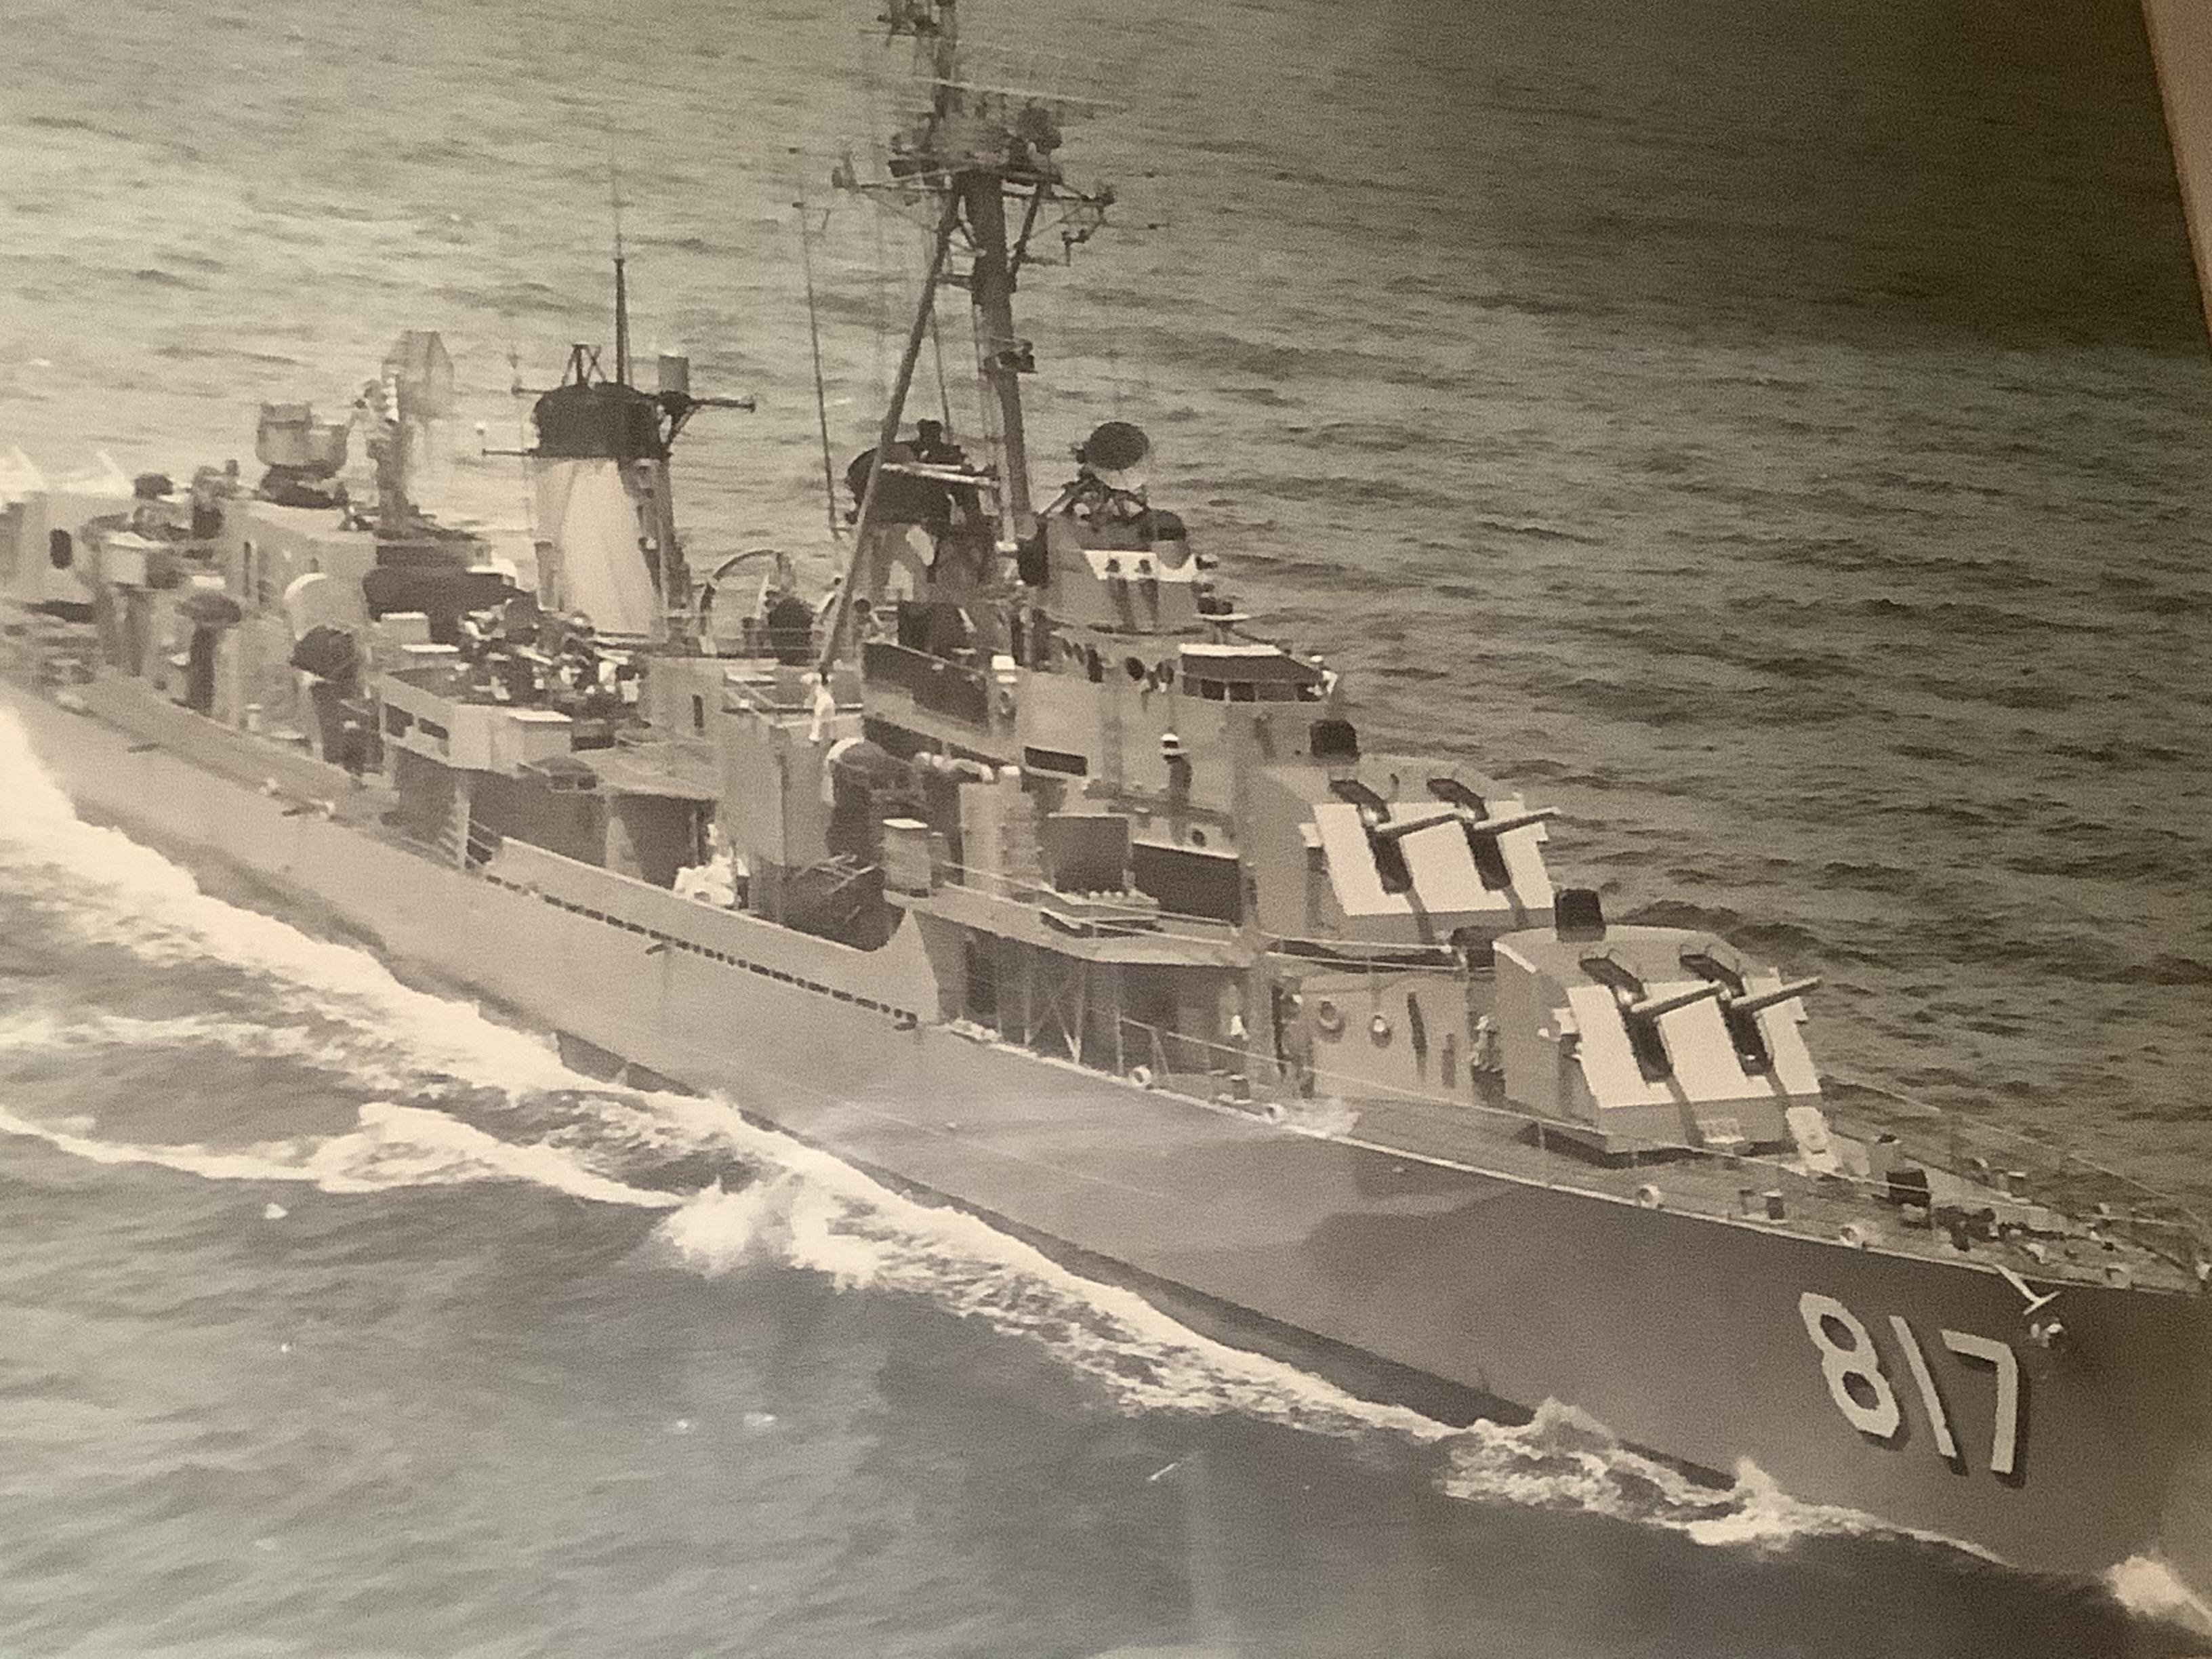 Hunter was a crewmember aboard a U.S. Navy Destroyer